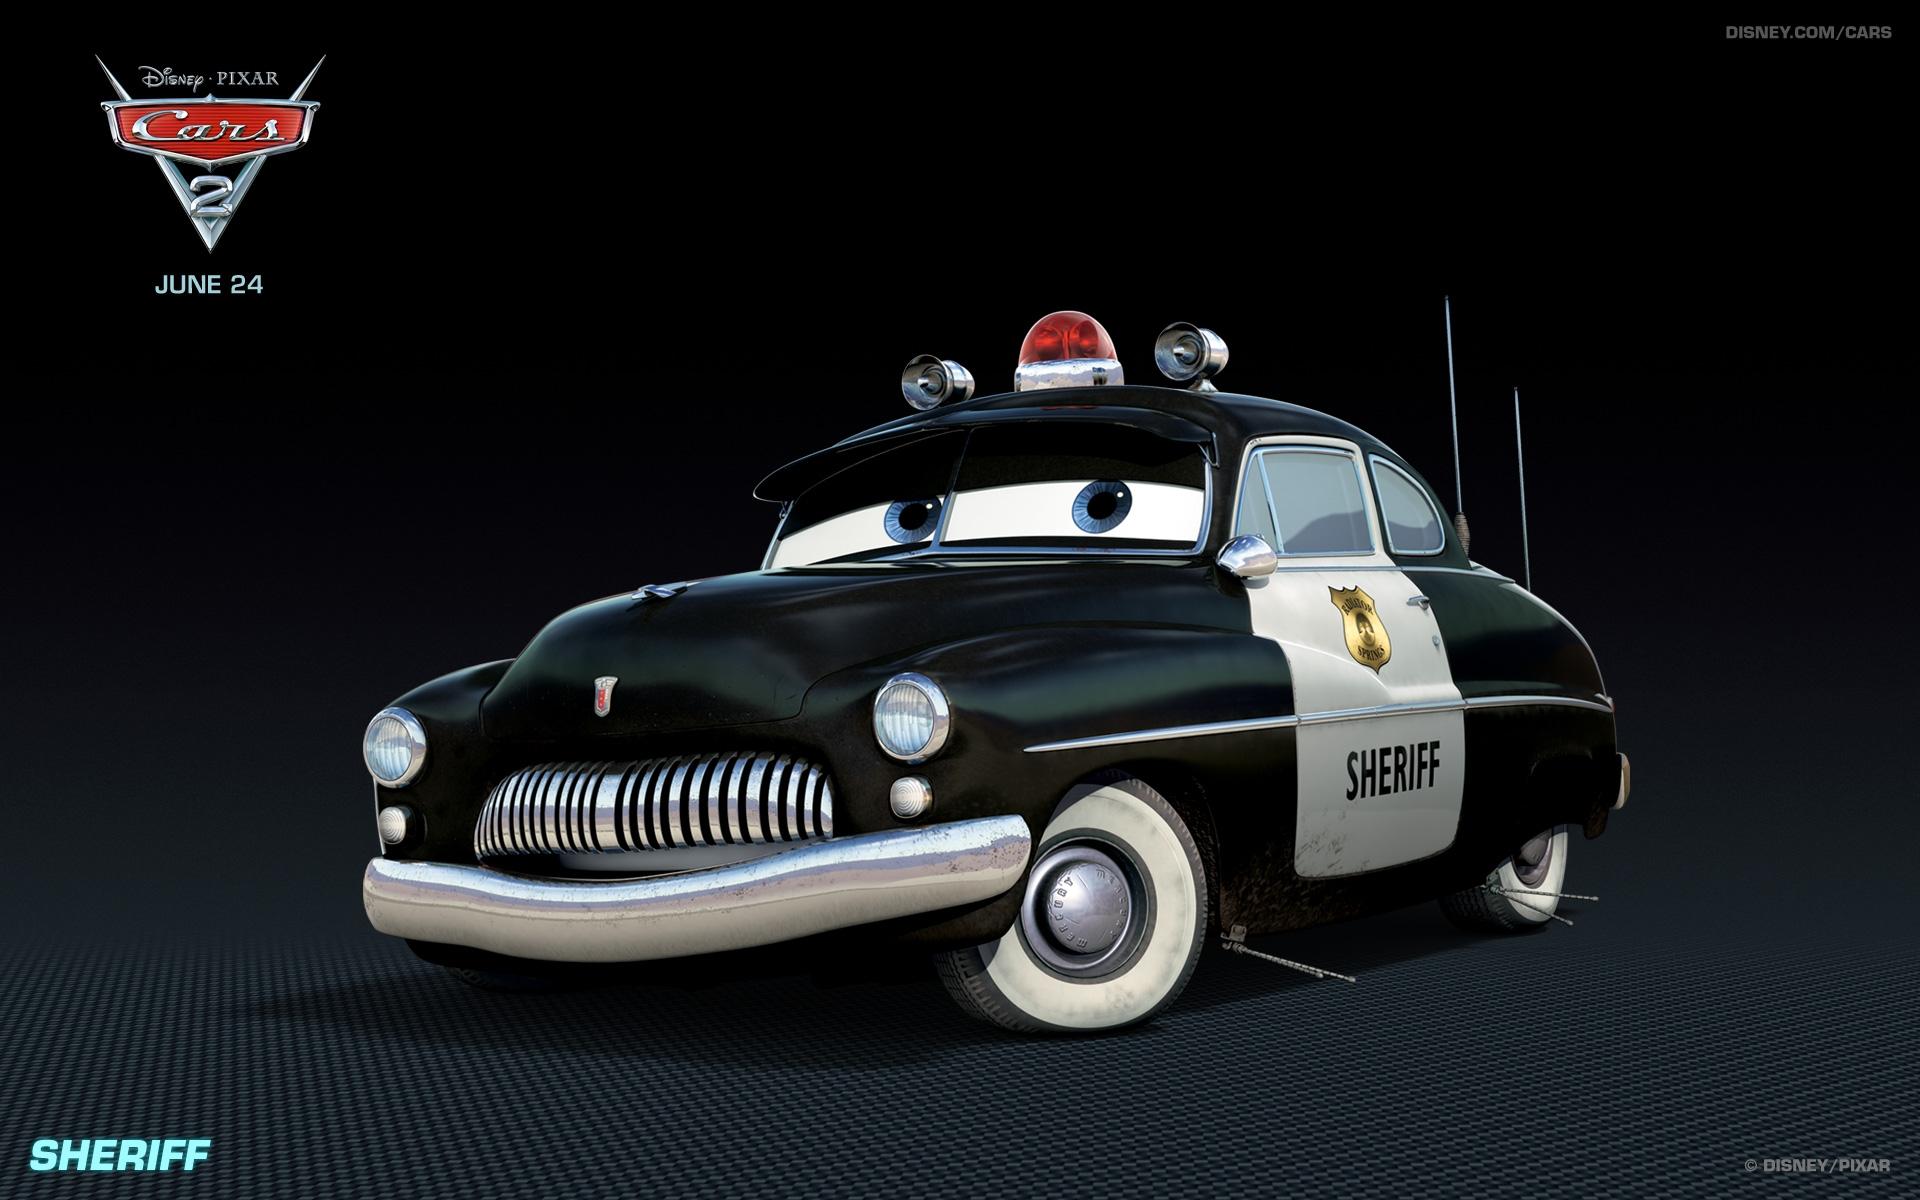 sheriff disney pixar cars 2 free hd wallpaper